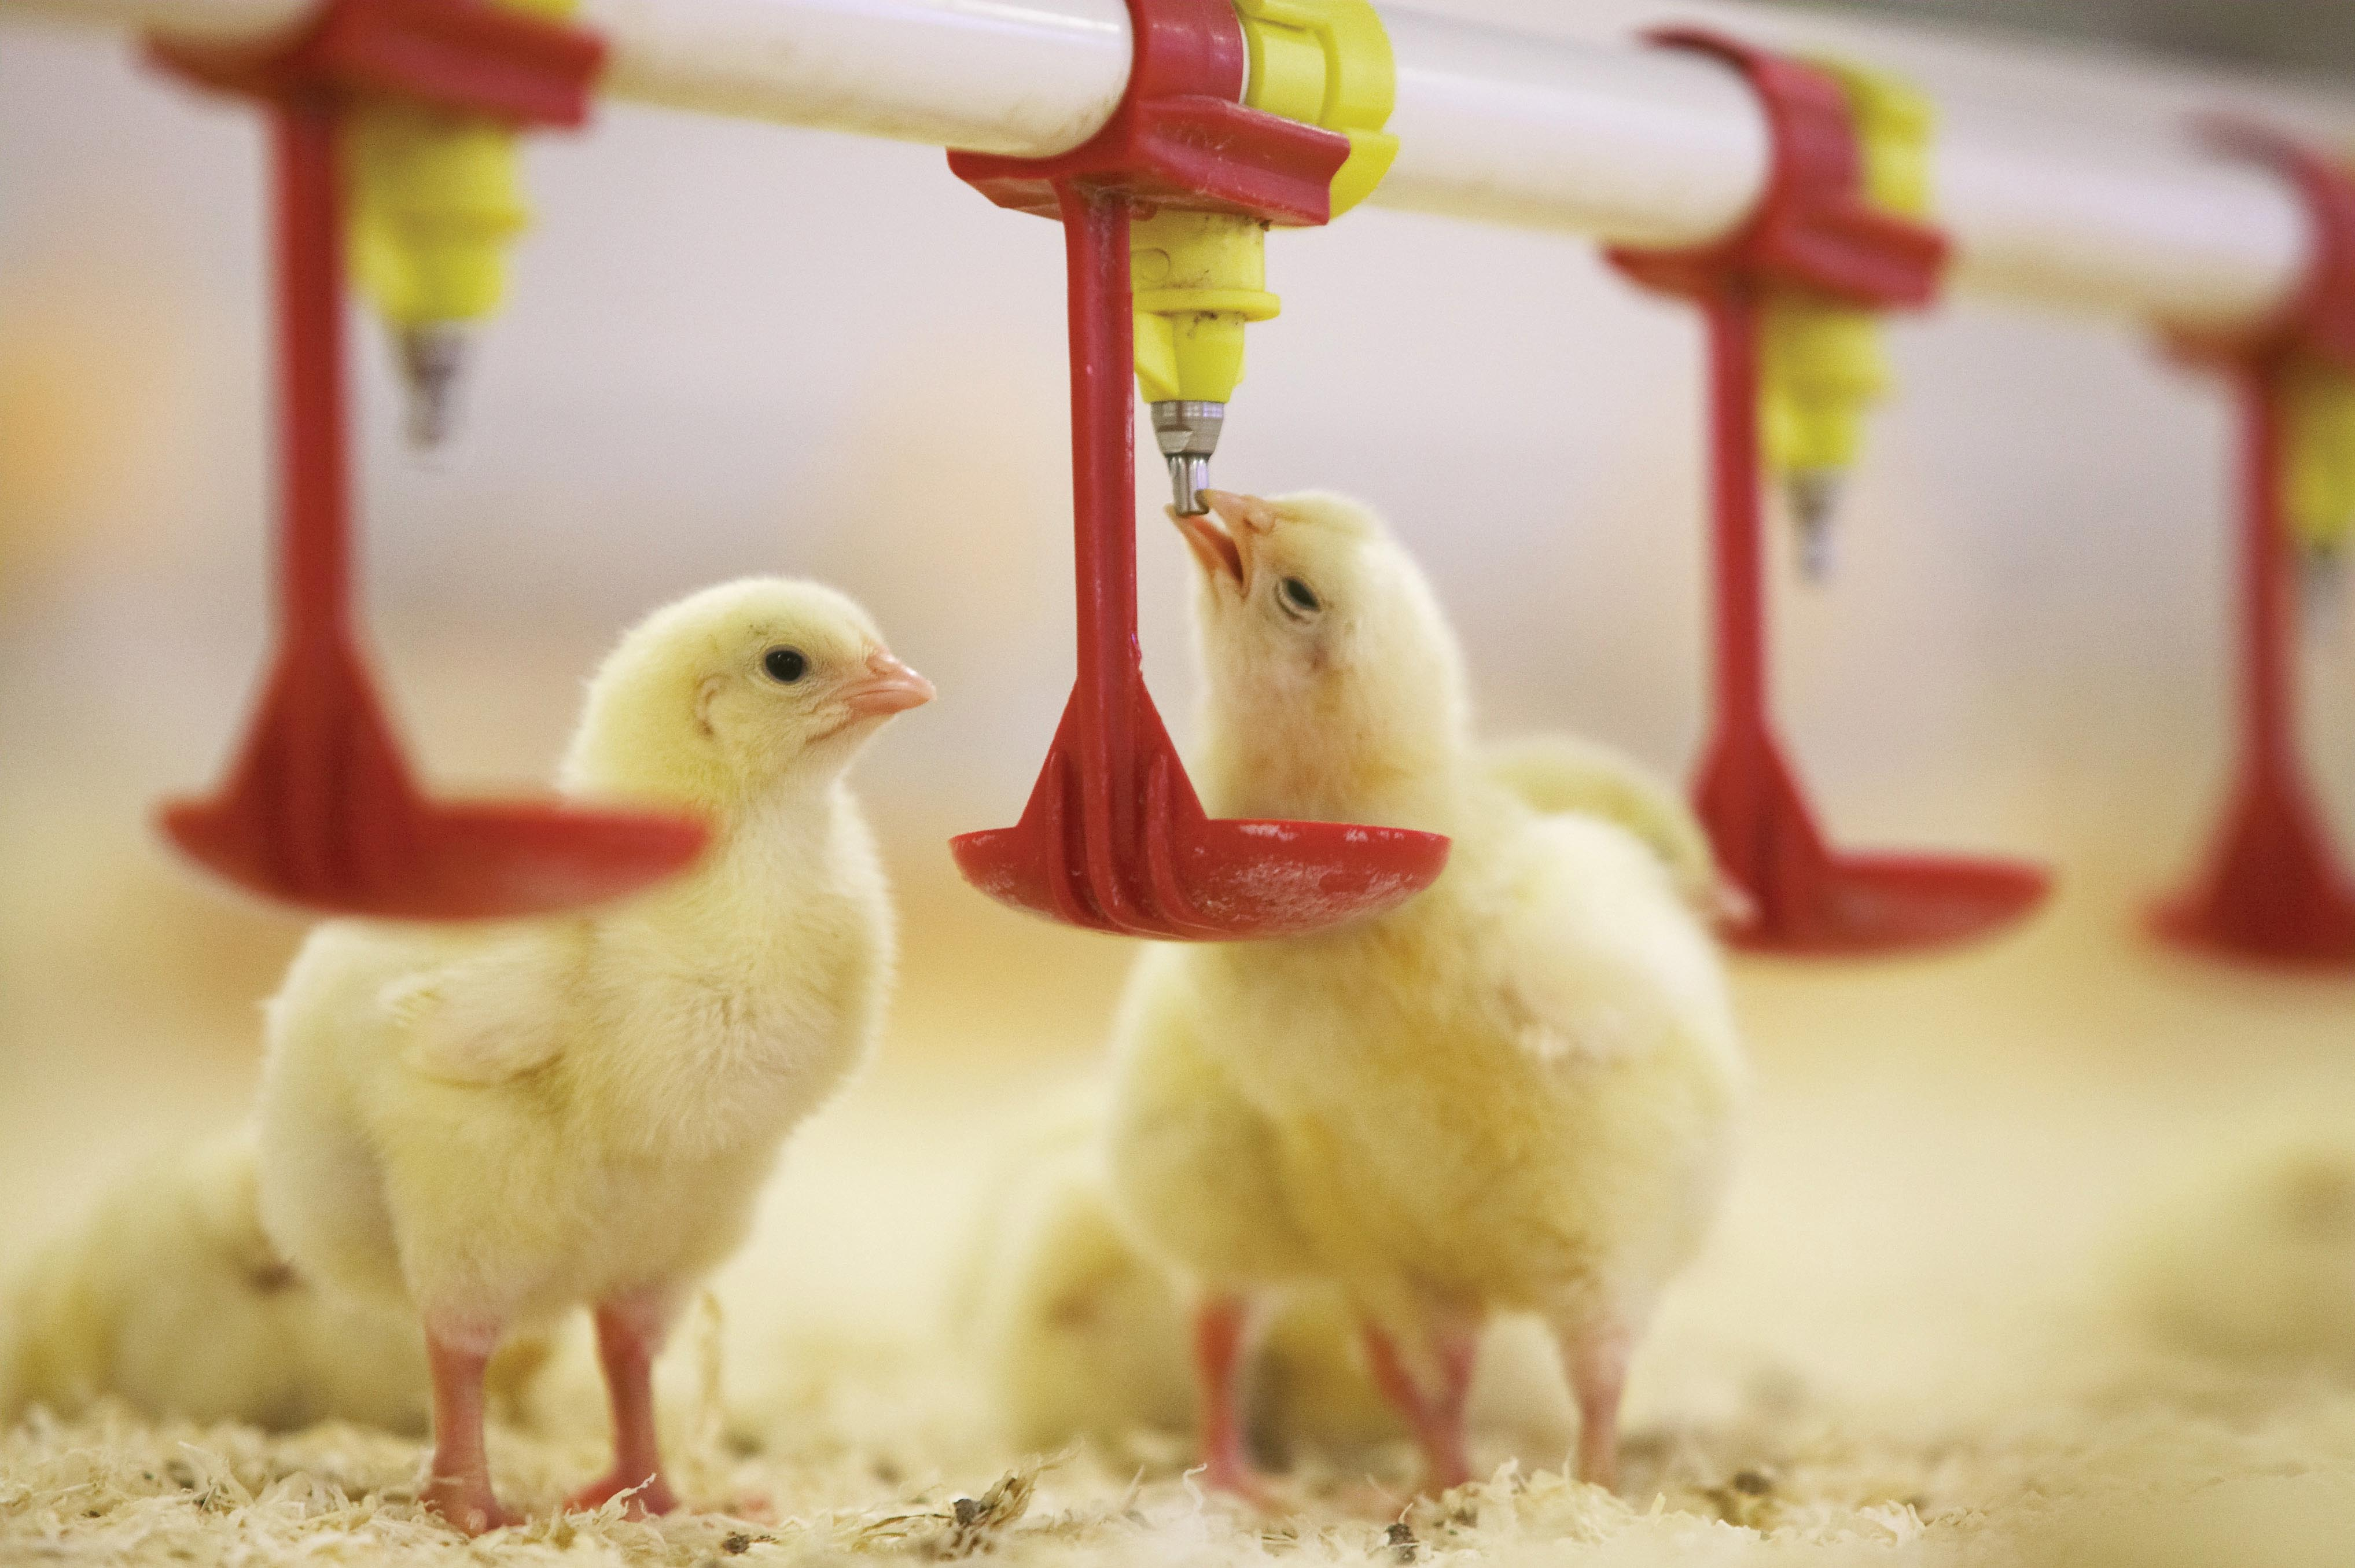 Rumenco Nettex chickens poultry